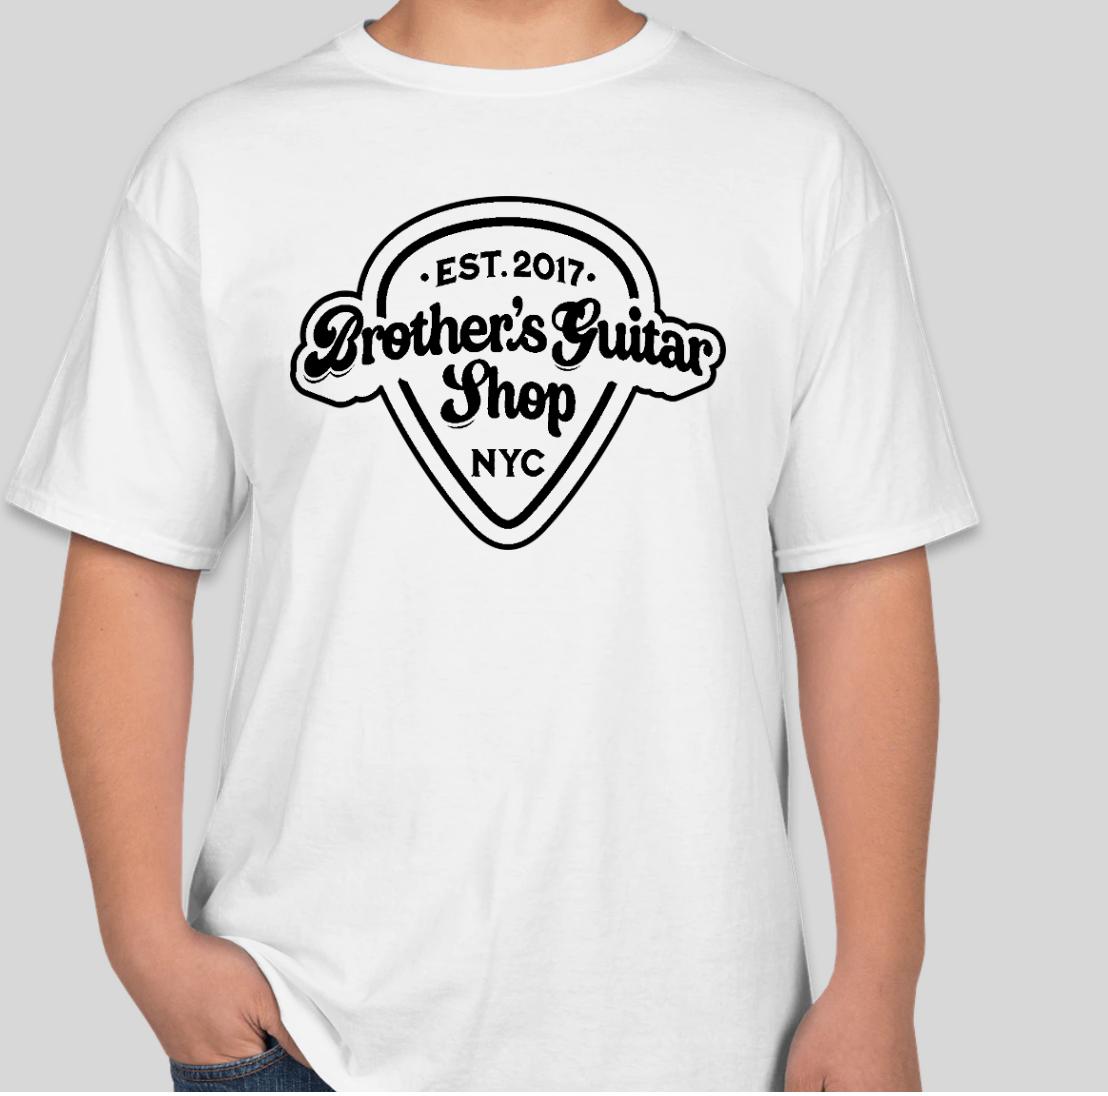 Brothers Logo T-Shirt Short White